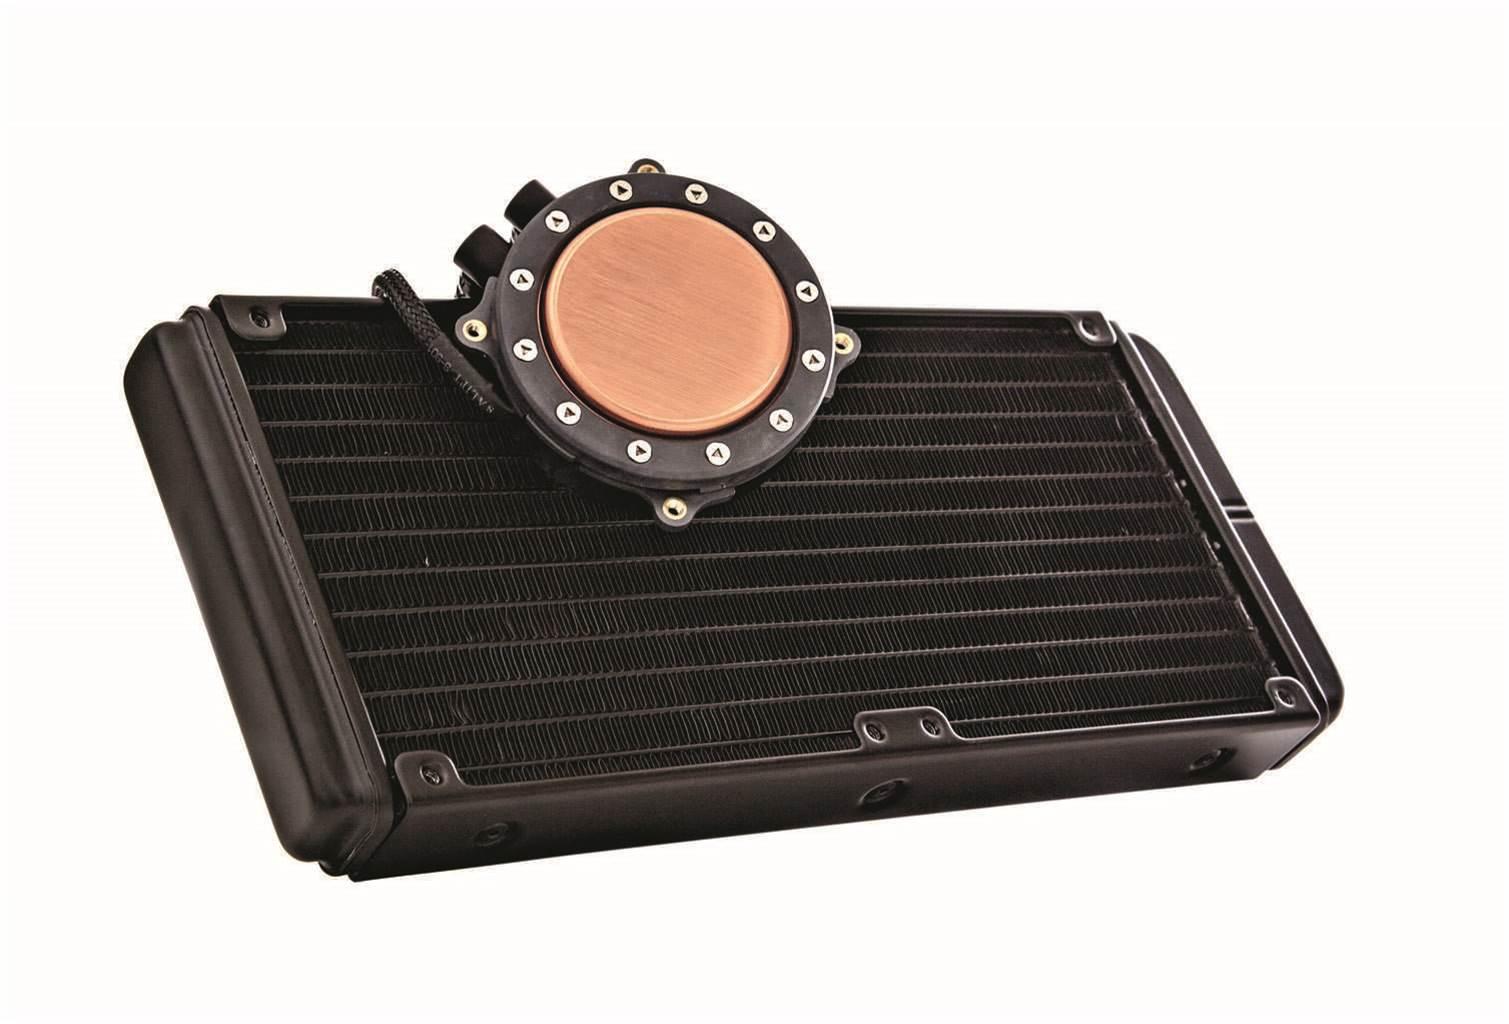 Labs Brief: Cooler Master Seidon 240M